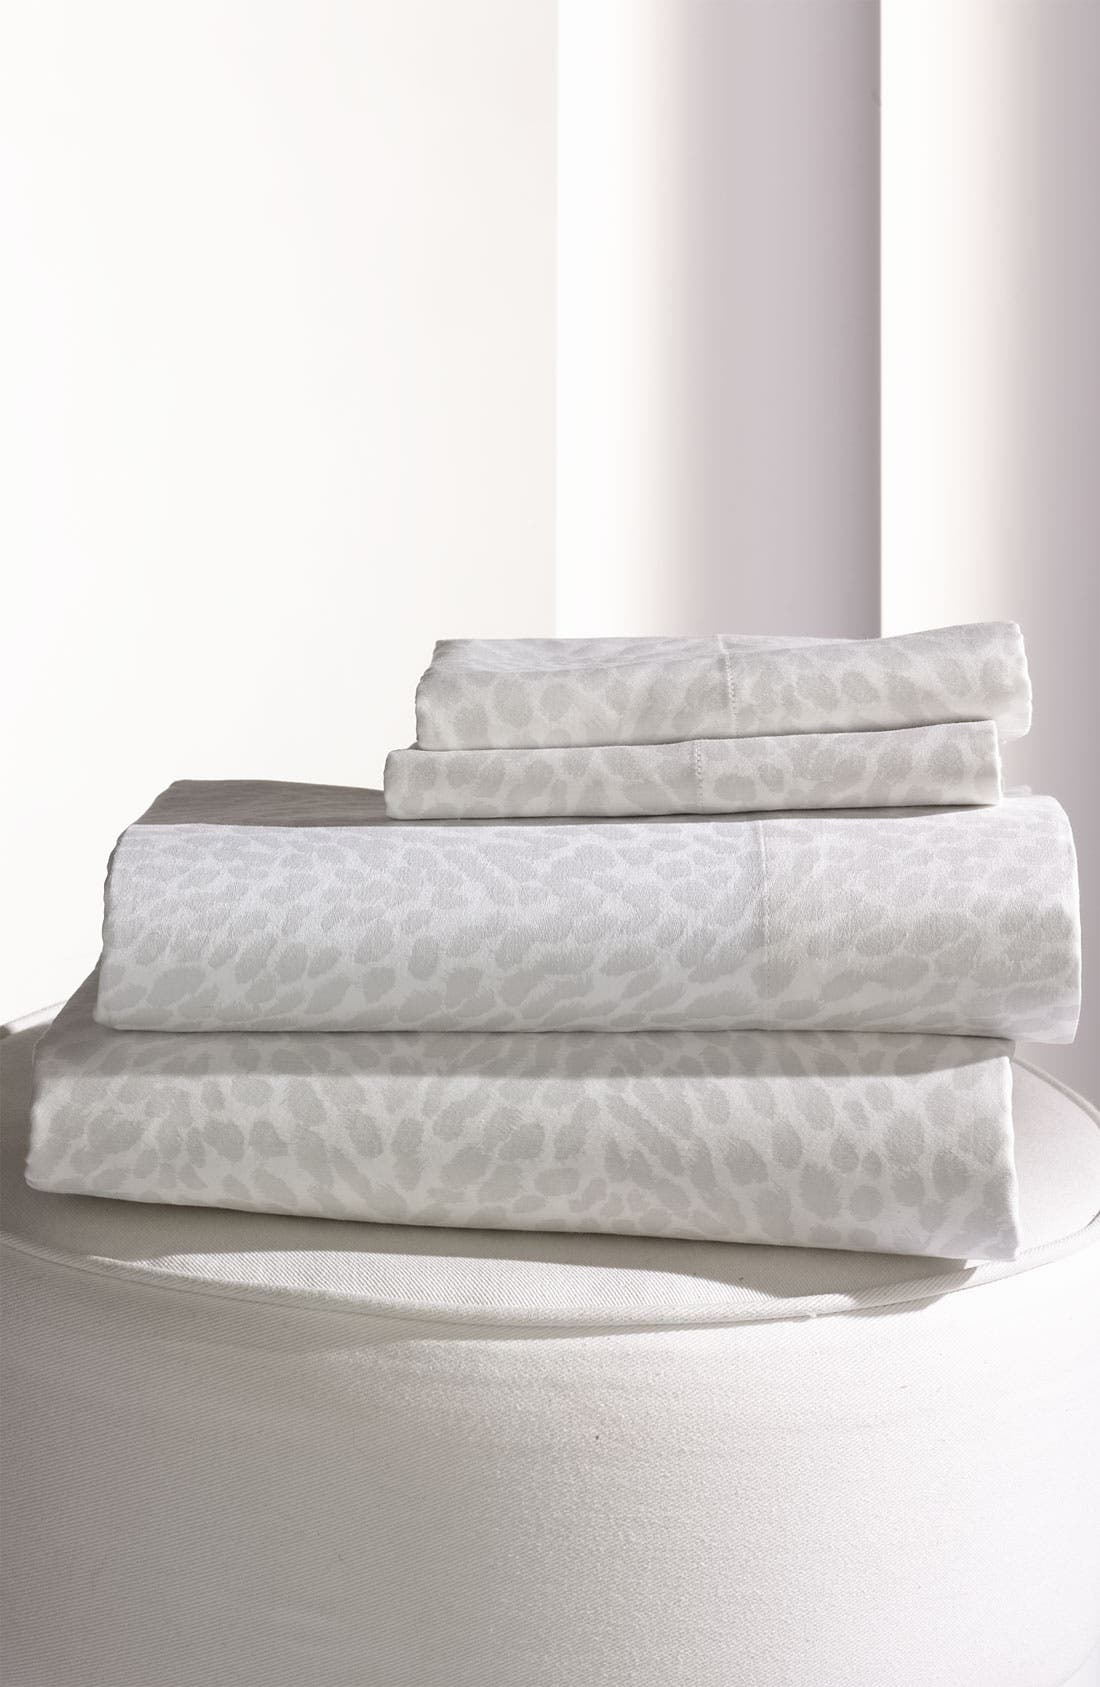 Alternate Image 1 Selected - Diane von Furstenberg 'Leopard' 300 Thread Count Pillowcase (Set of 2)